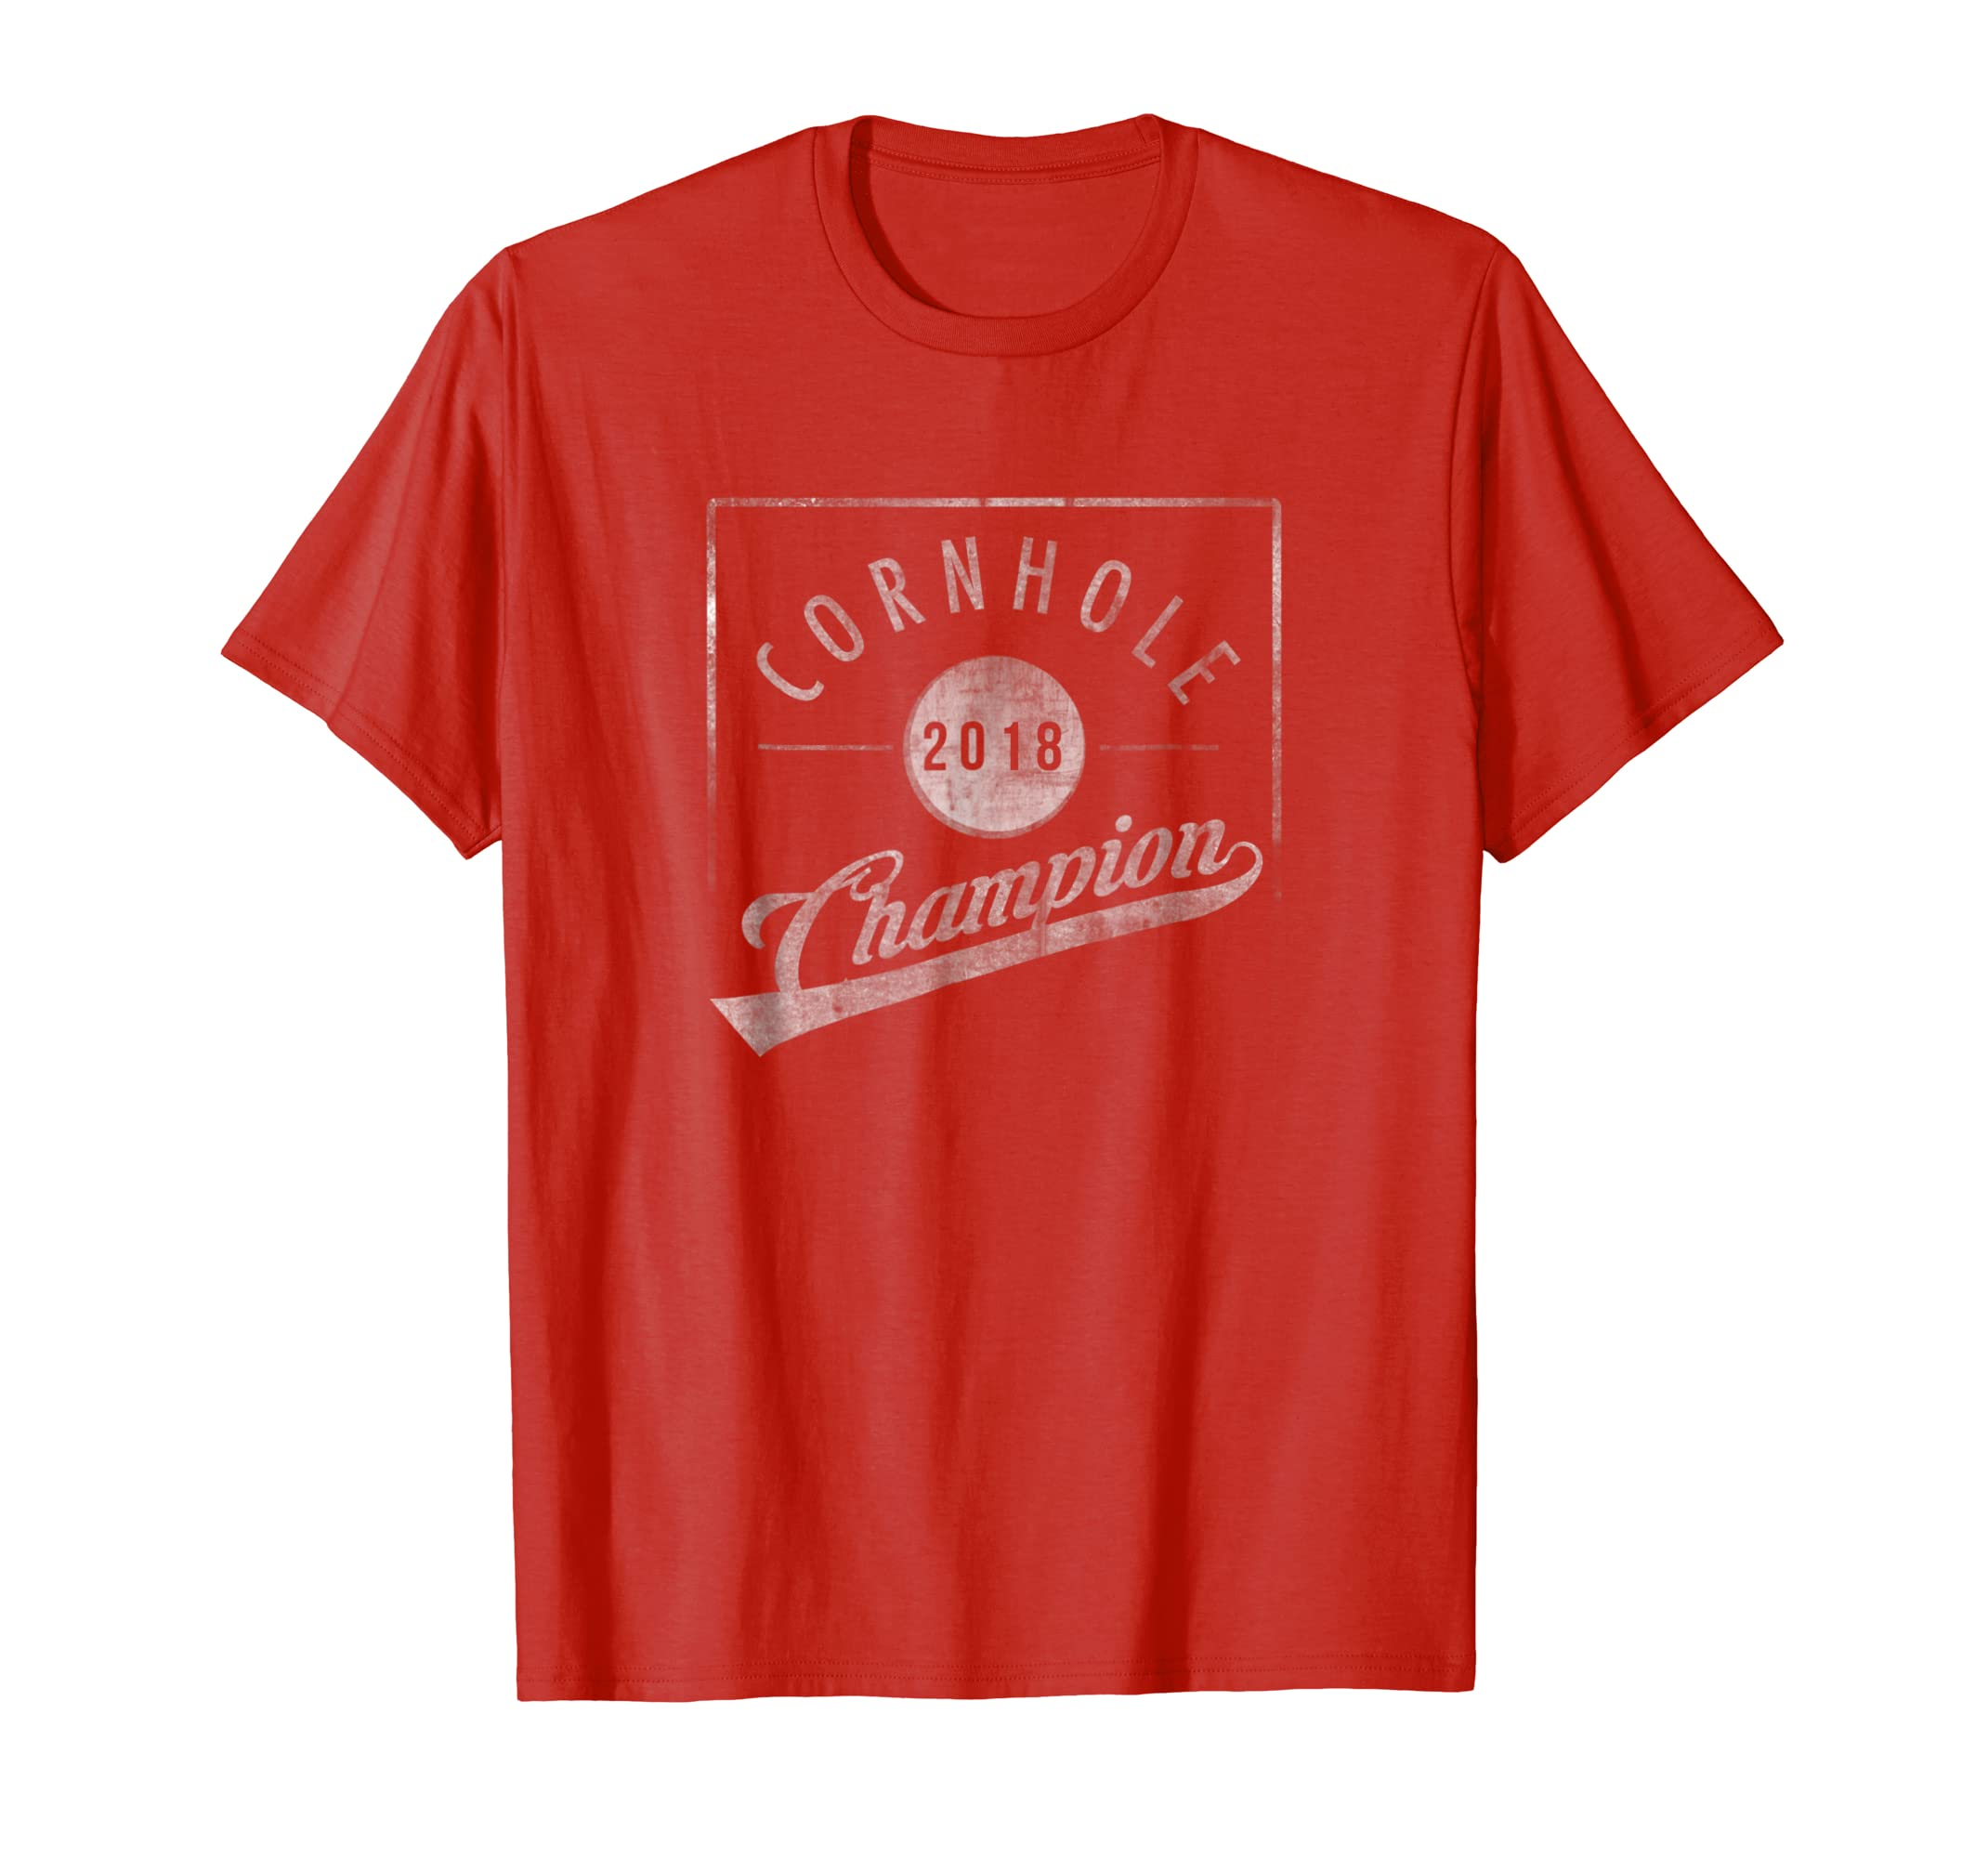 Funny 2018 Cornhole Champion Shirt-fa